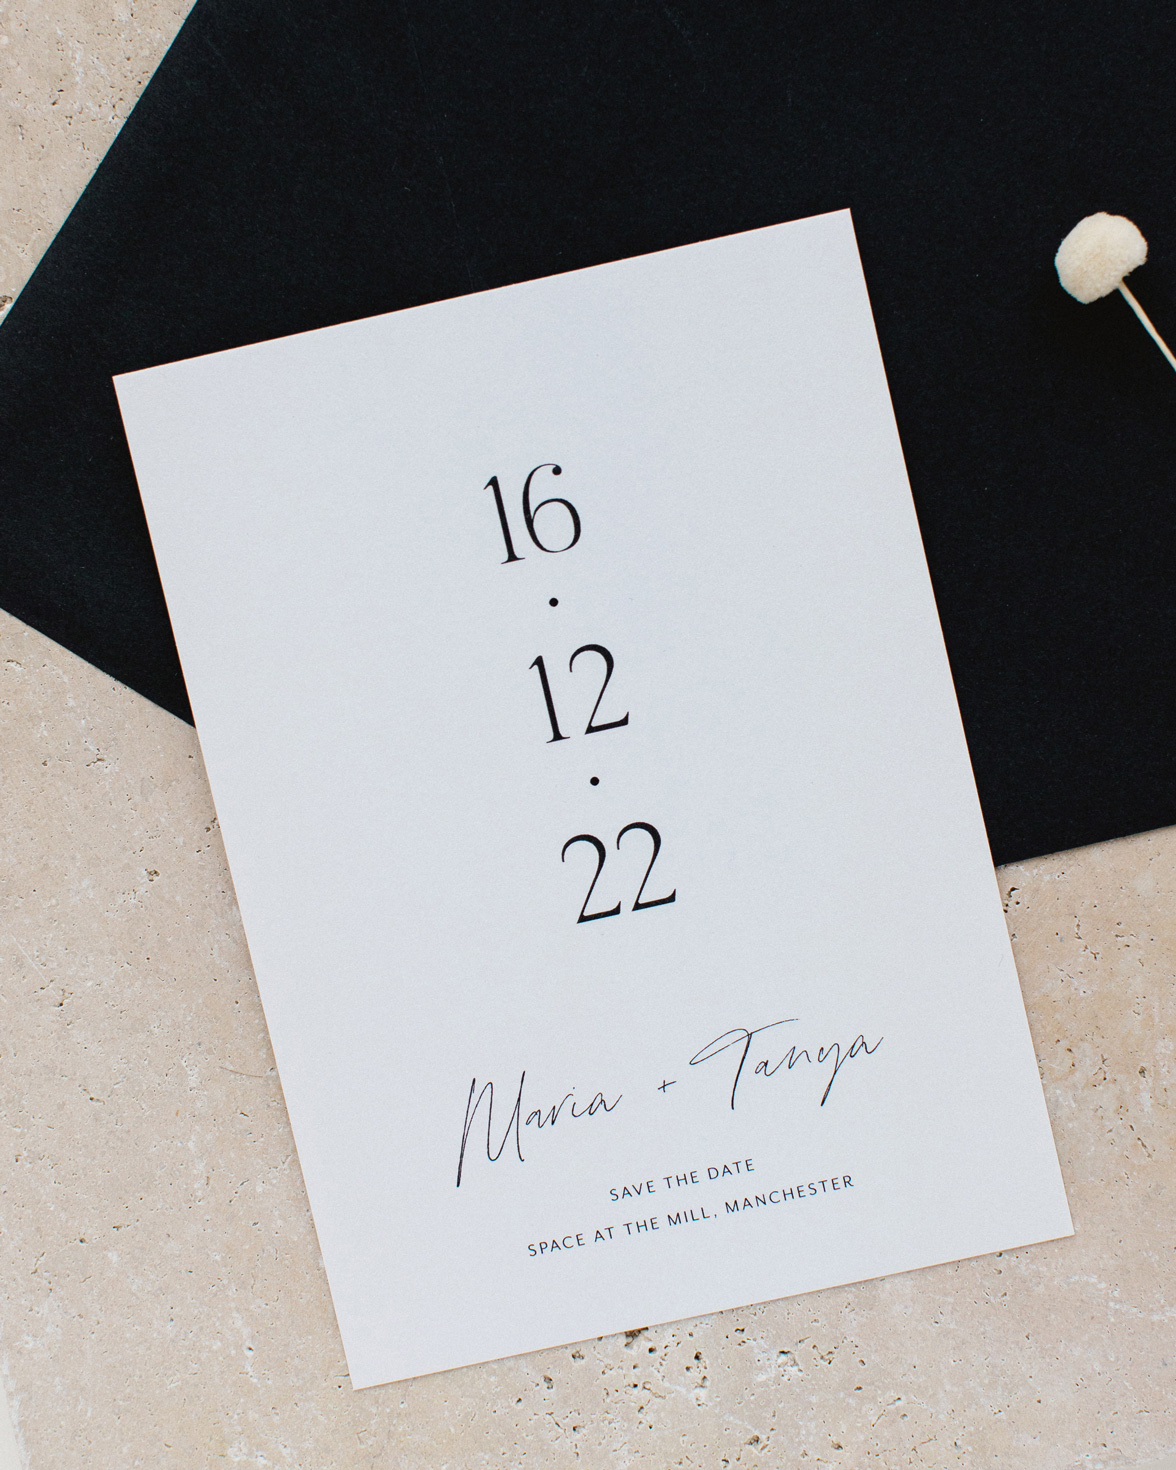 Half Arch wedding save the date